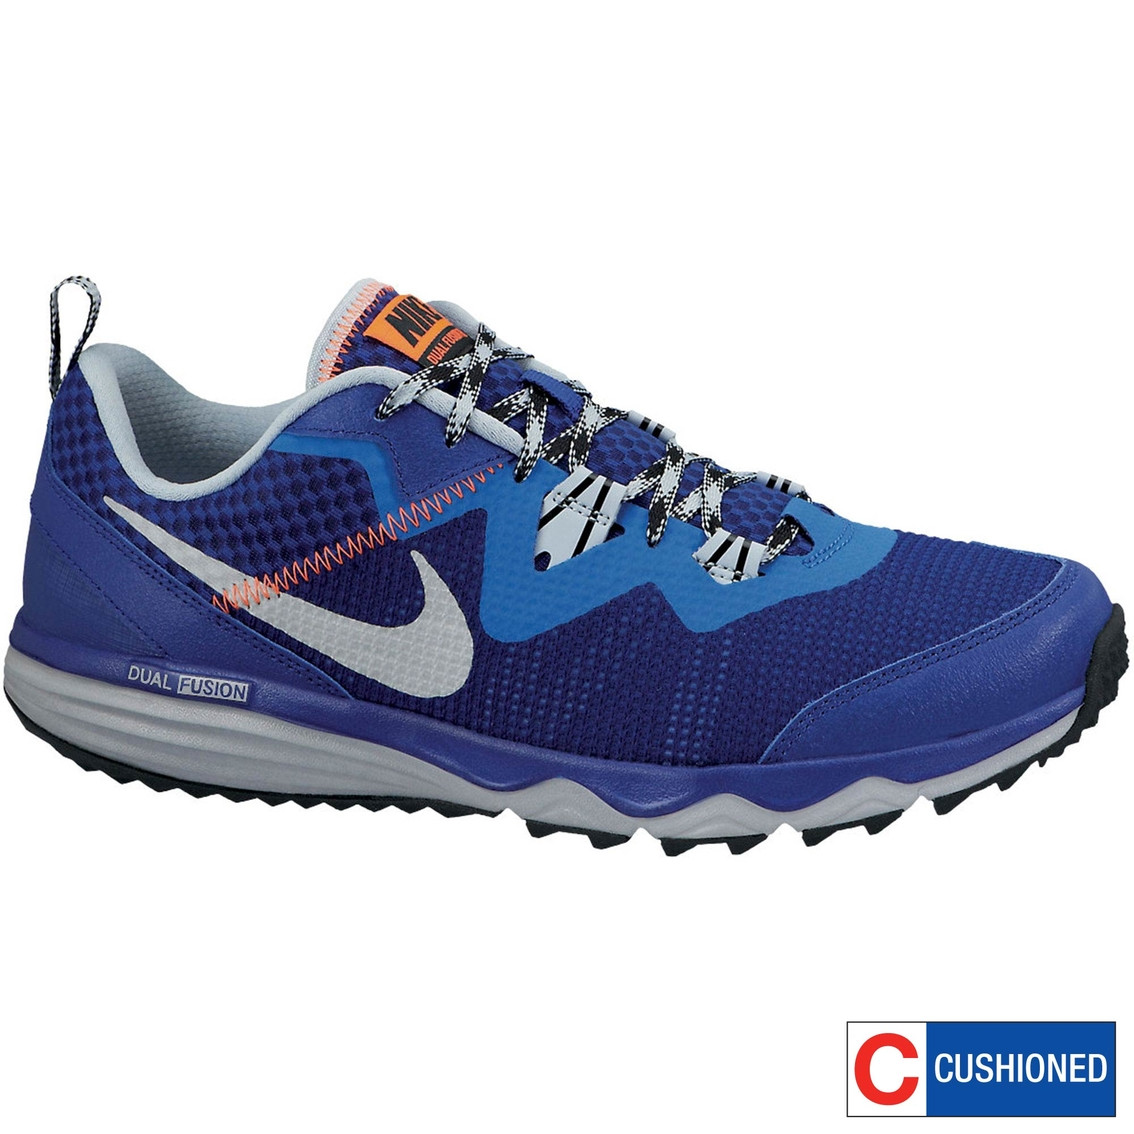 Mens Nike Dual Fusion Trail Running Shoes